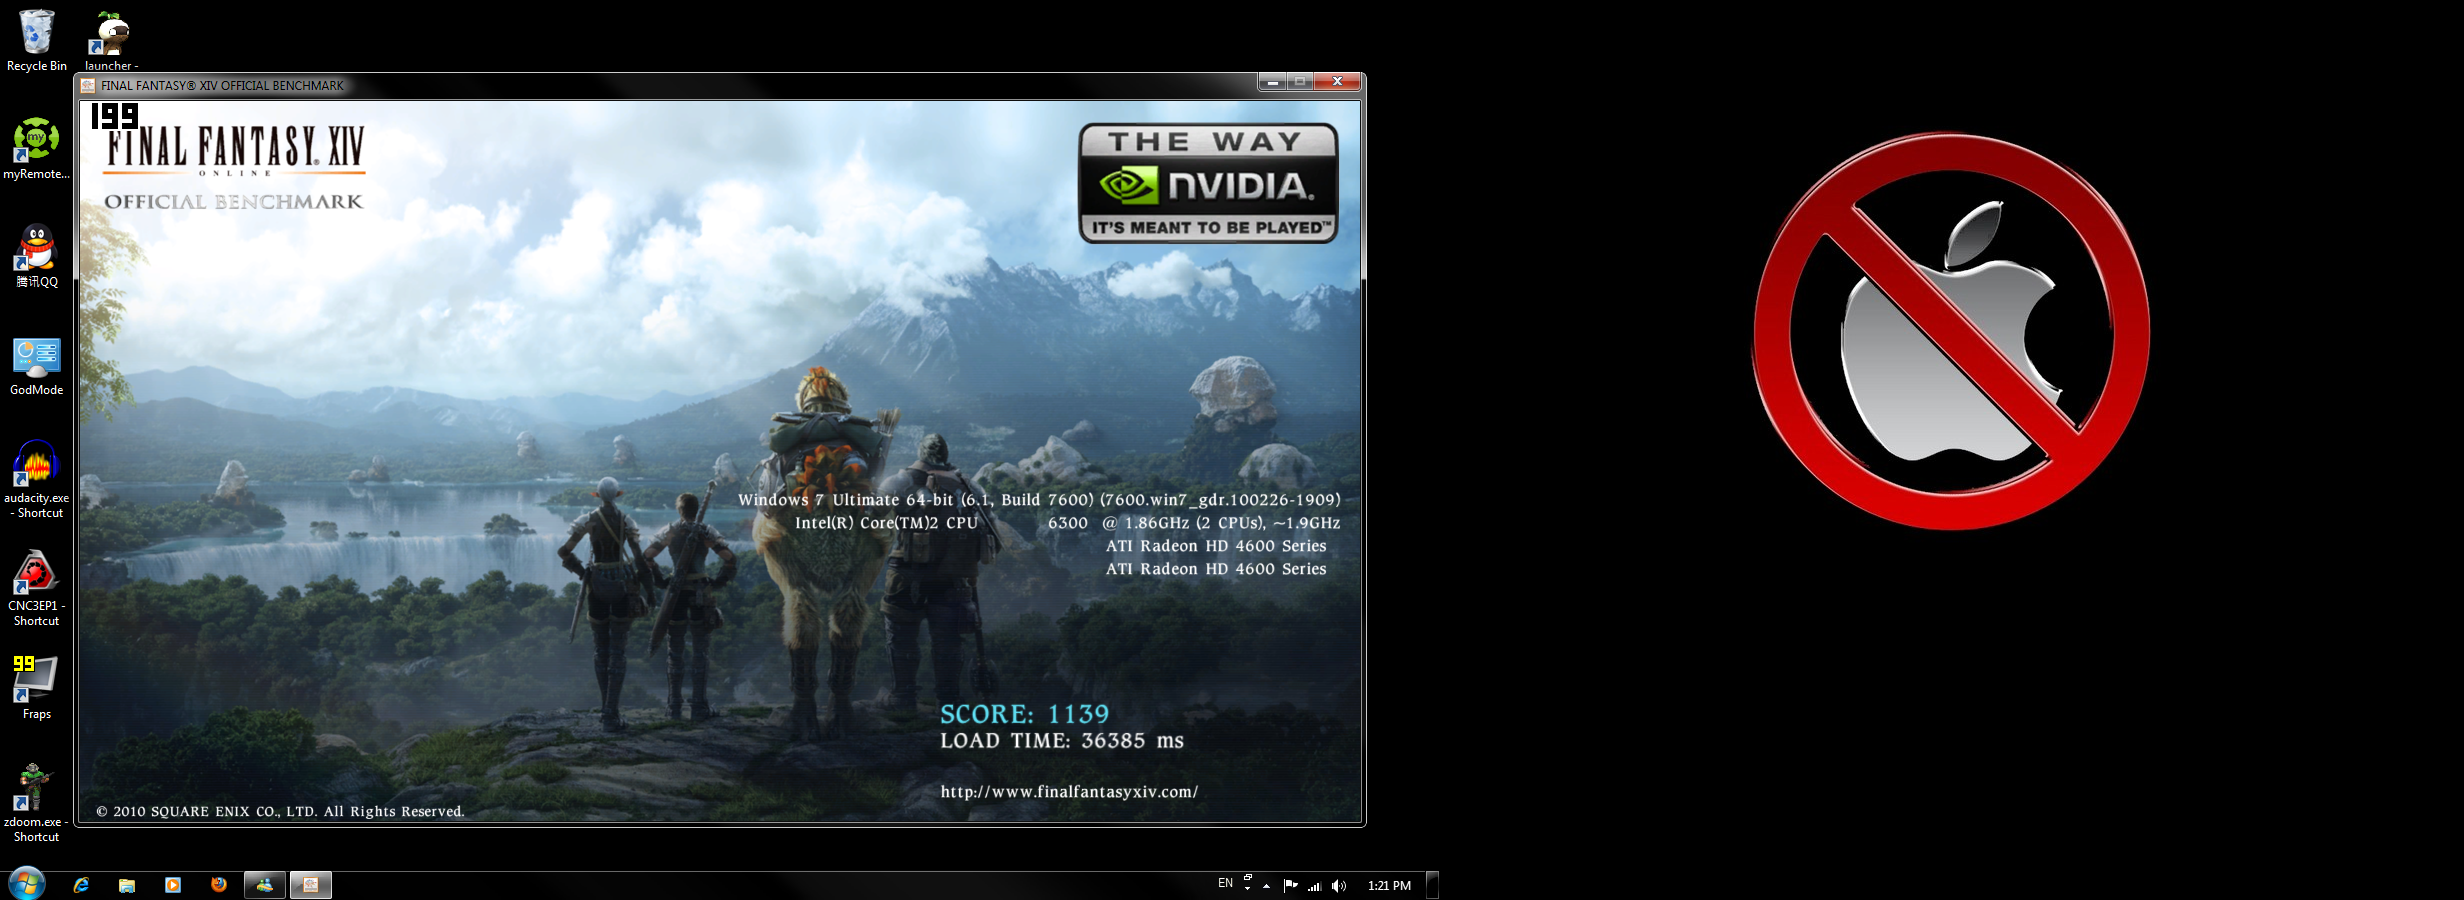 egon ffxiv benchmark fullscreen high errors runtime performance thread beta official 1090t single card 5850 41ghz